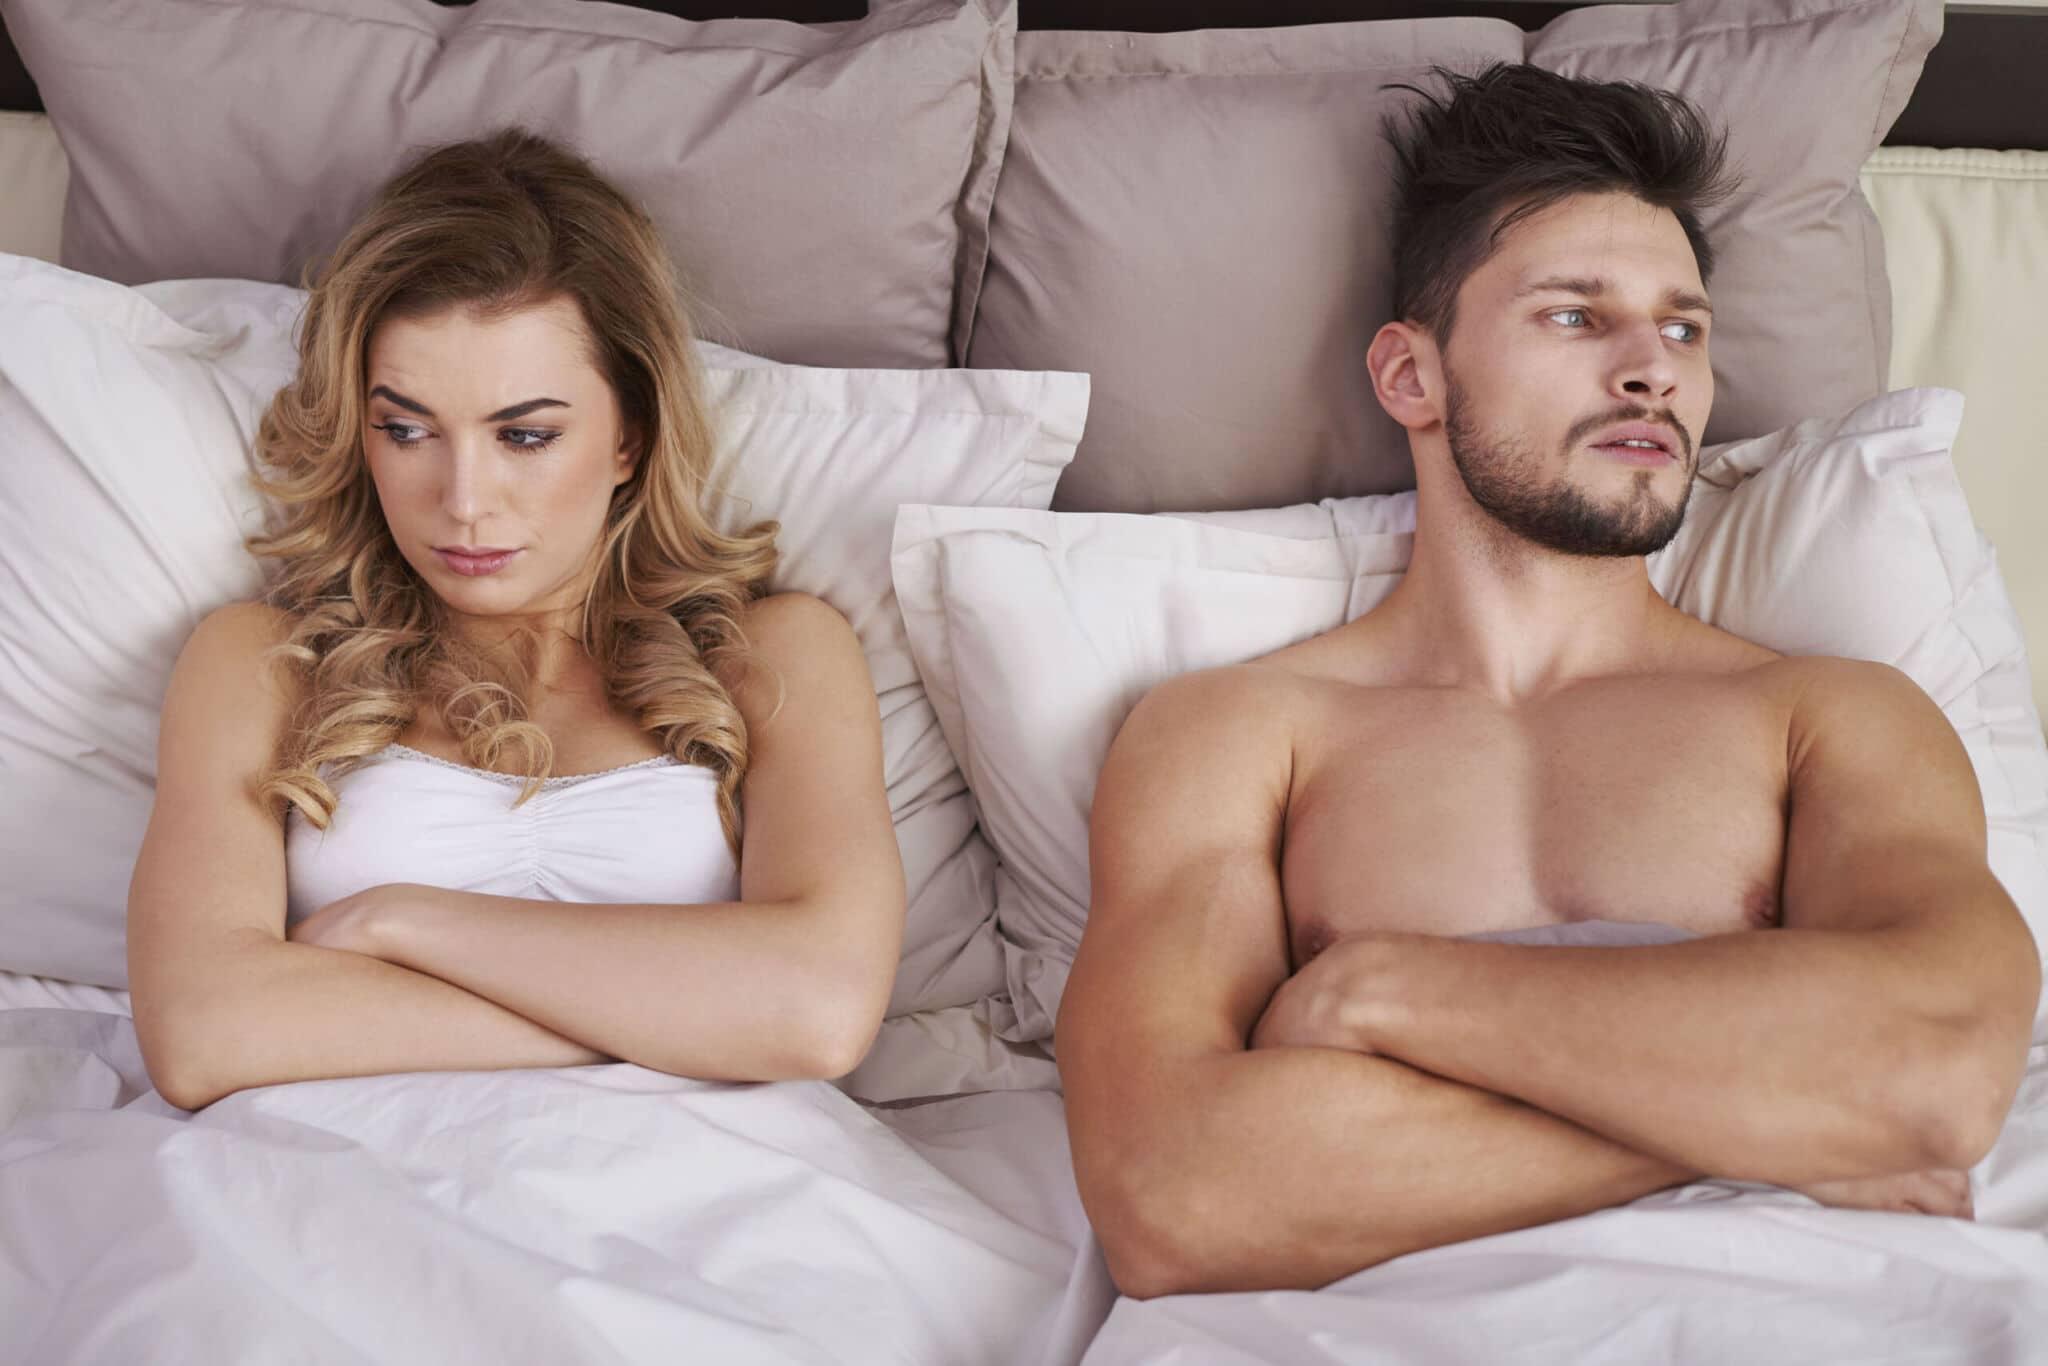 Men's 4 Most Common Questions About Sex